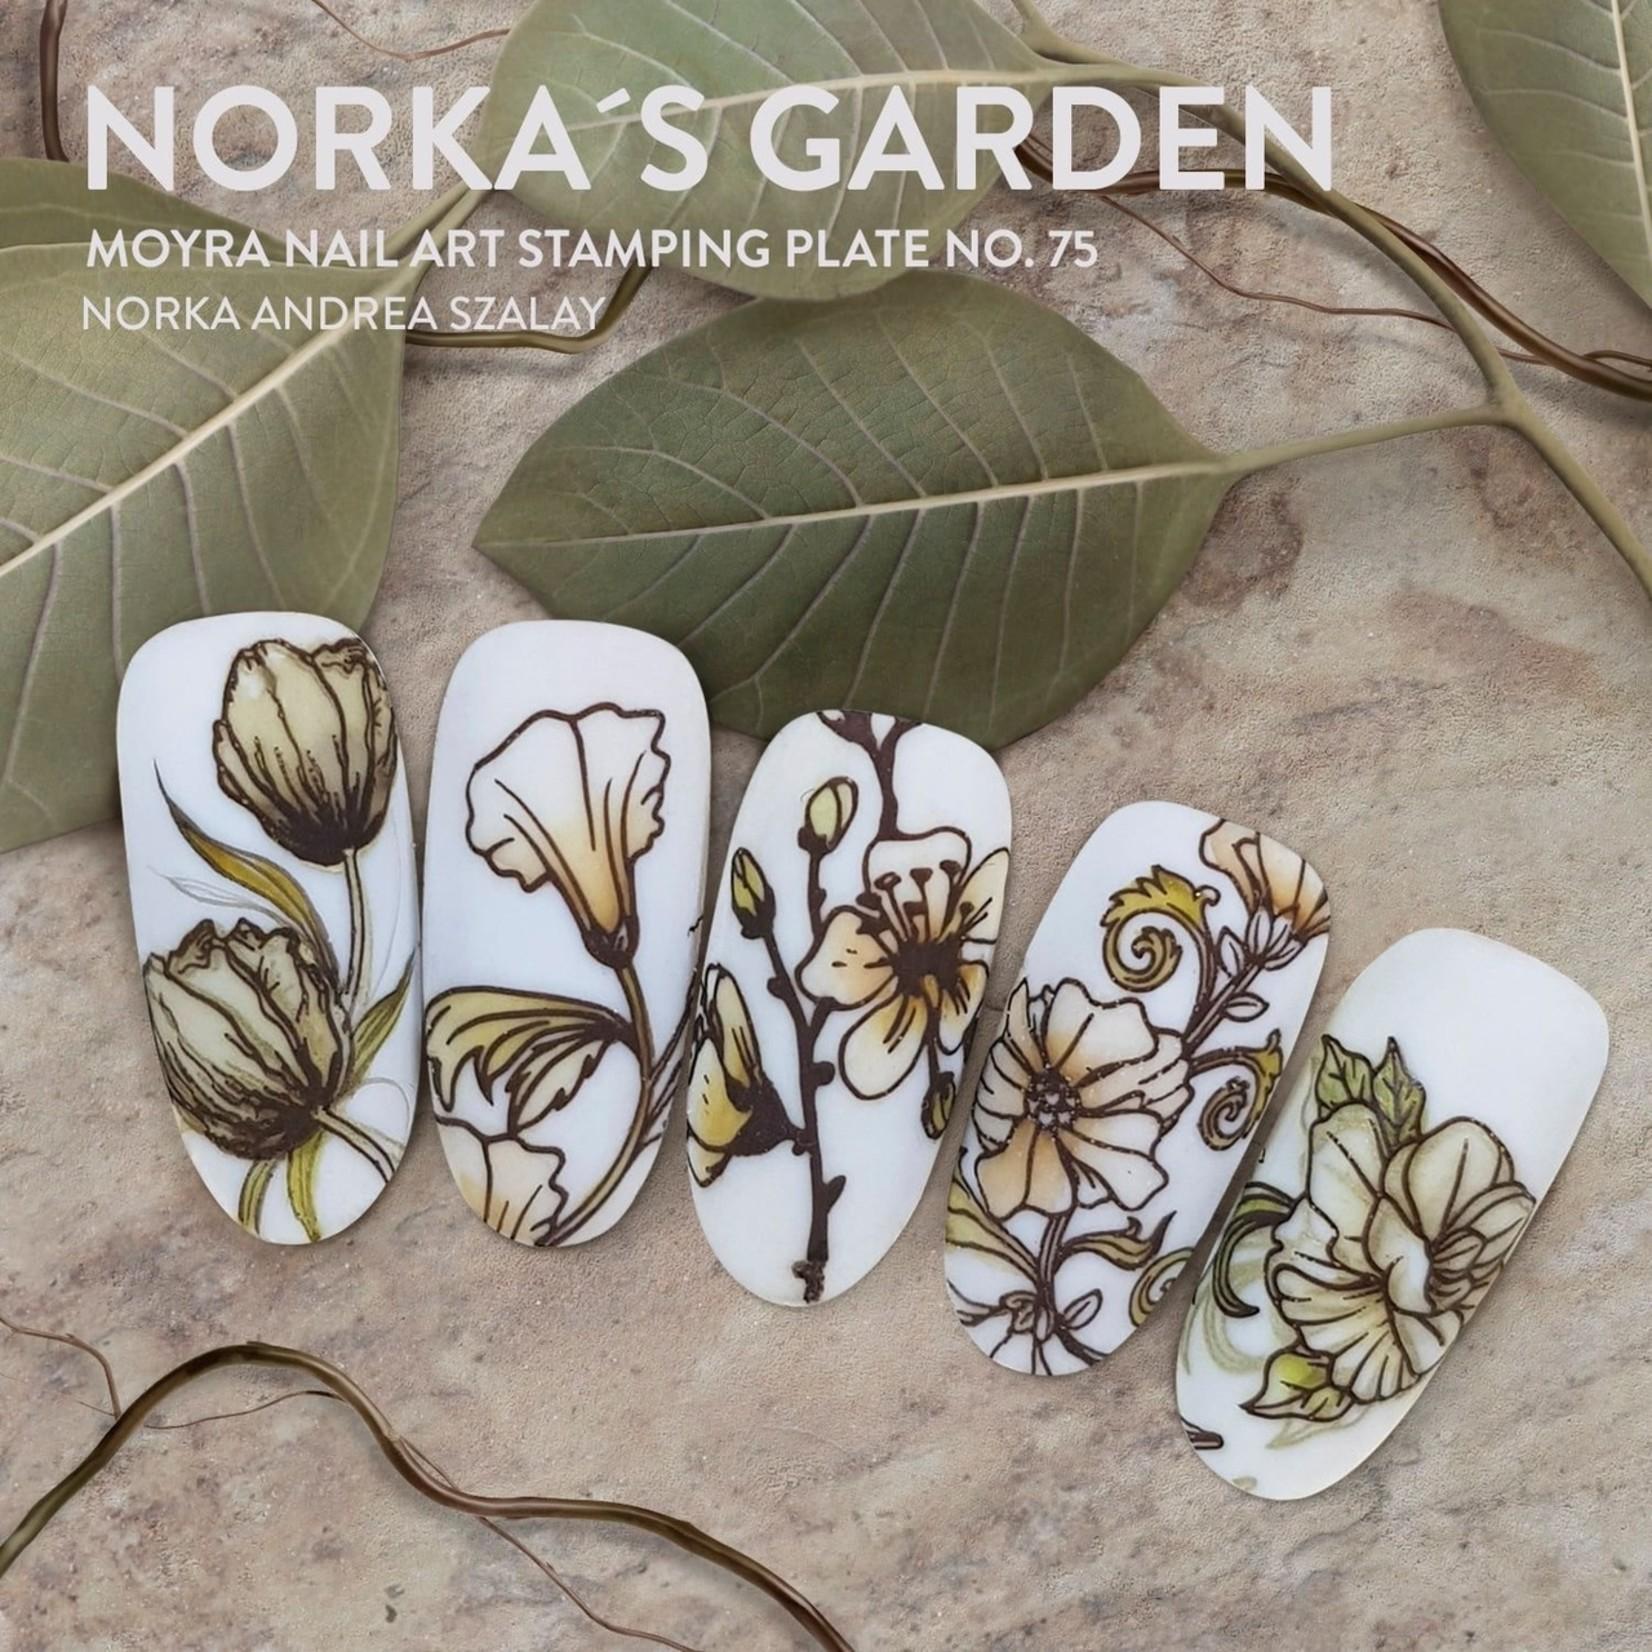 Moyra Moyra Stamping plate 75 Norka's garden